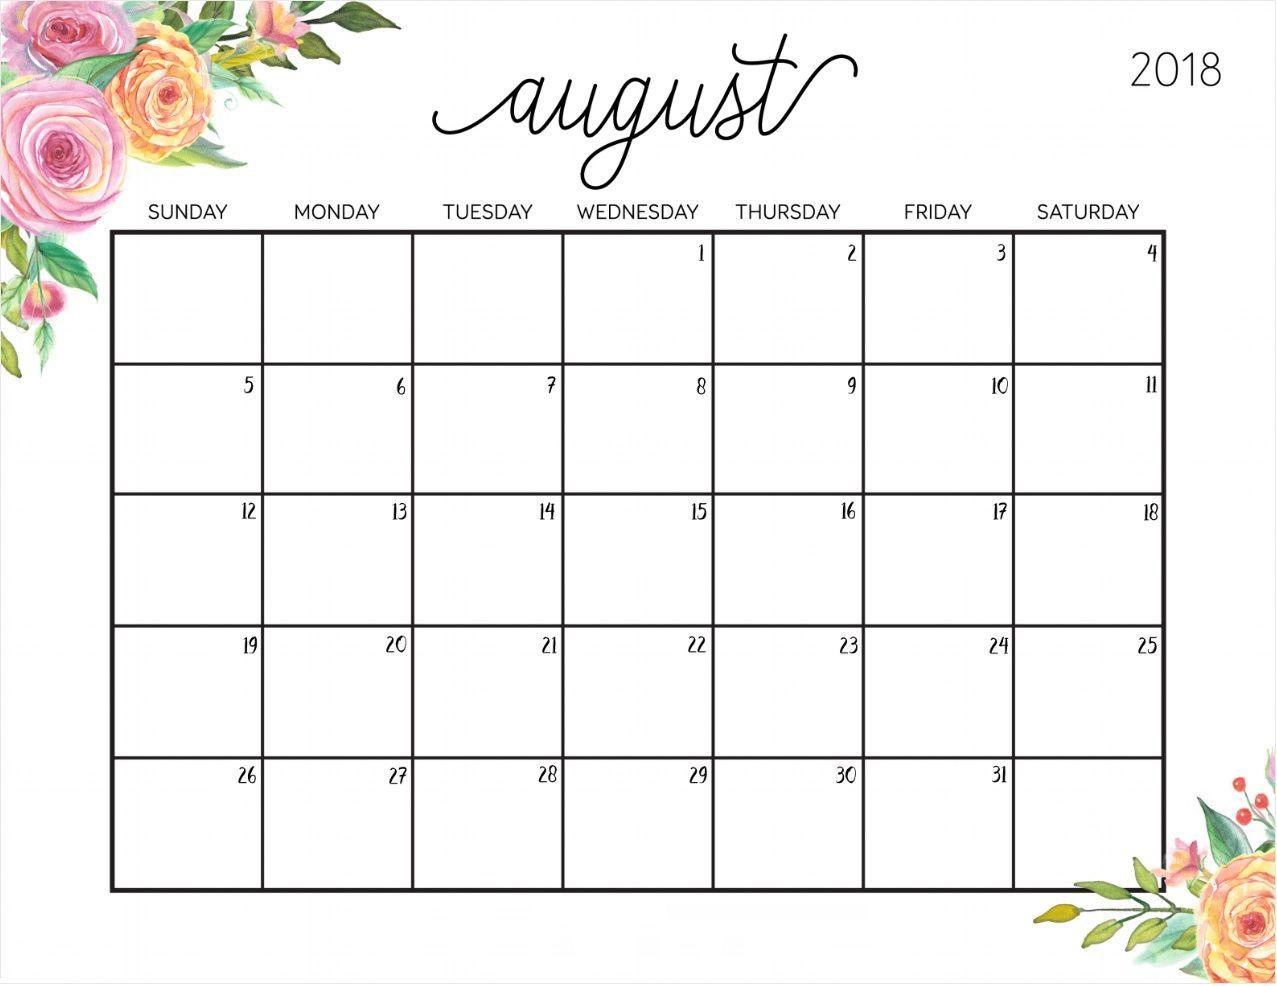 Pinkirstin Palasz On Calendars | December Calendar, Printable inside Cute August Calendar Printable Template